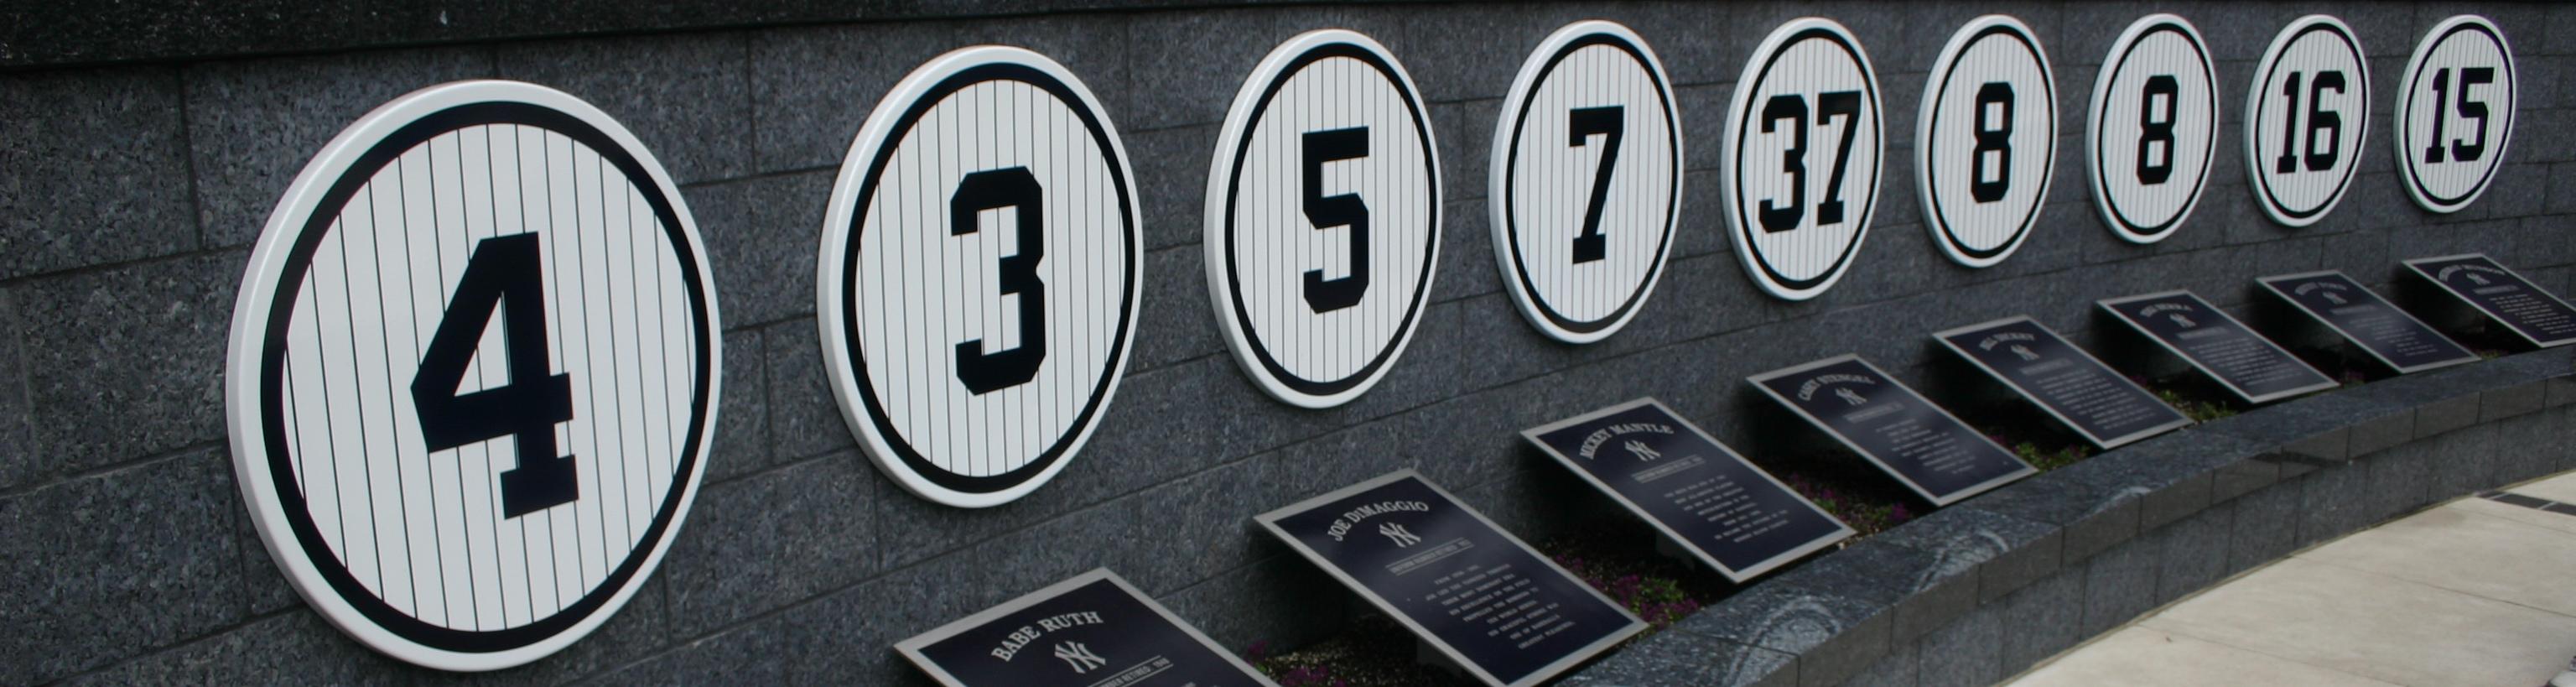 Yankee_Stadium_Monument_Park_Numbers.jpg